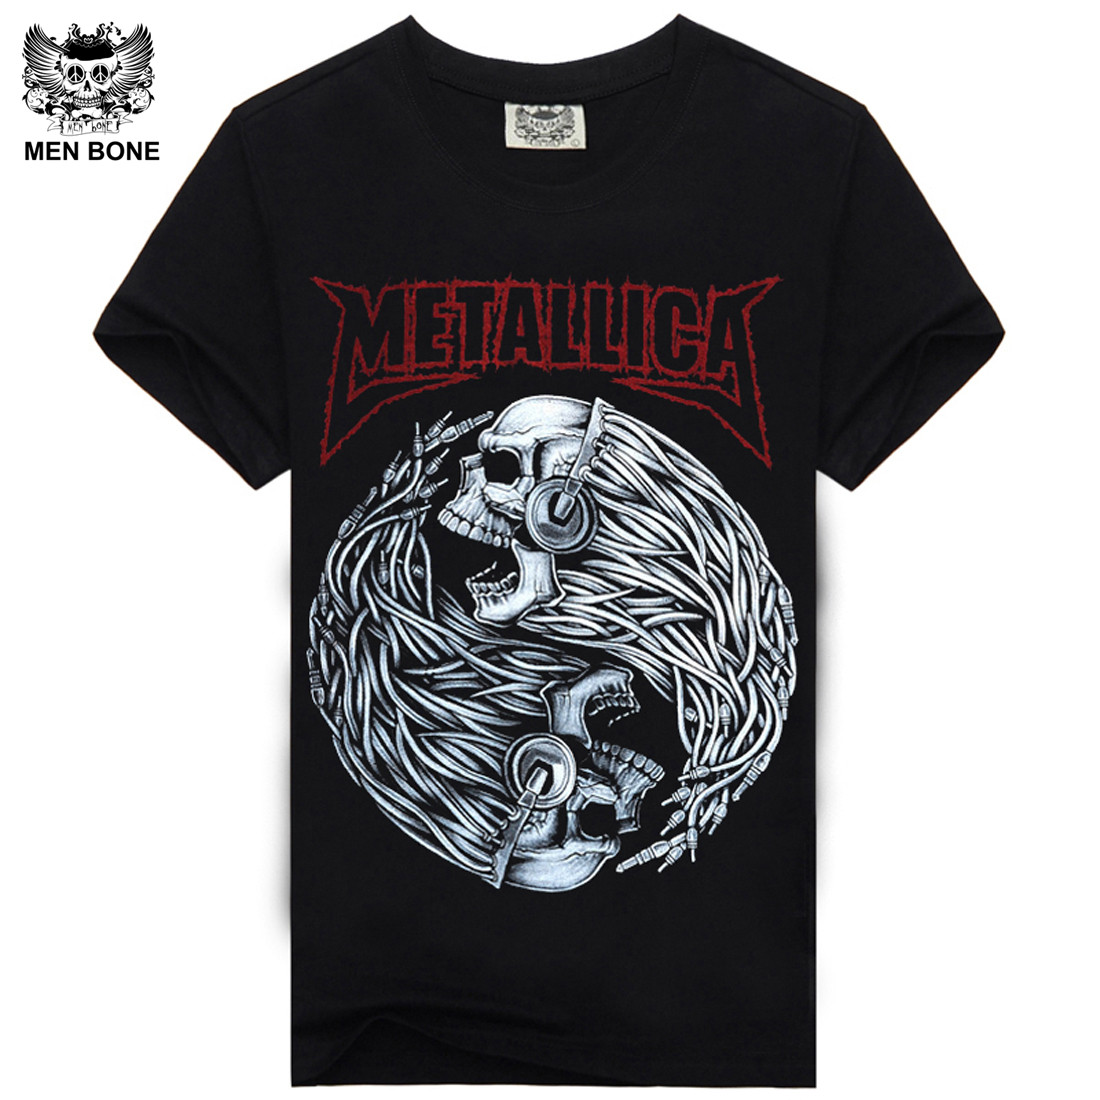 Mne bone Tee Men Black T-Shirt 100% Cotton Metallica Skull Print Heavy Metal Rock Hip Hop Clothing Black short T shirts